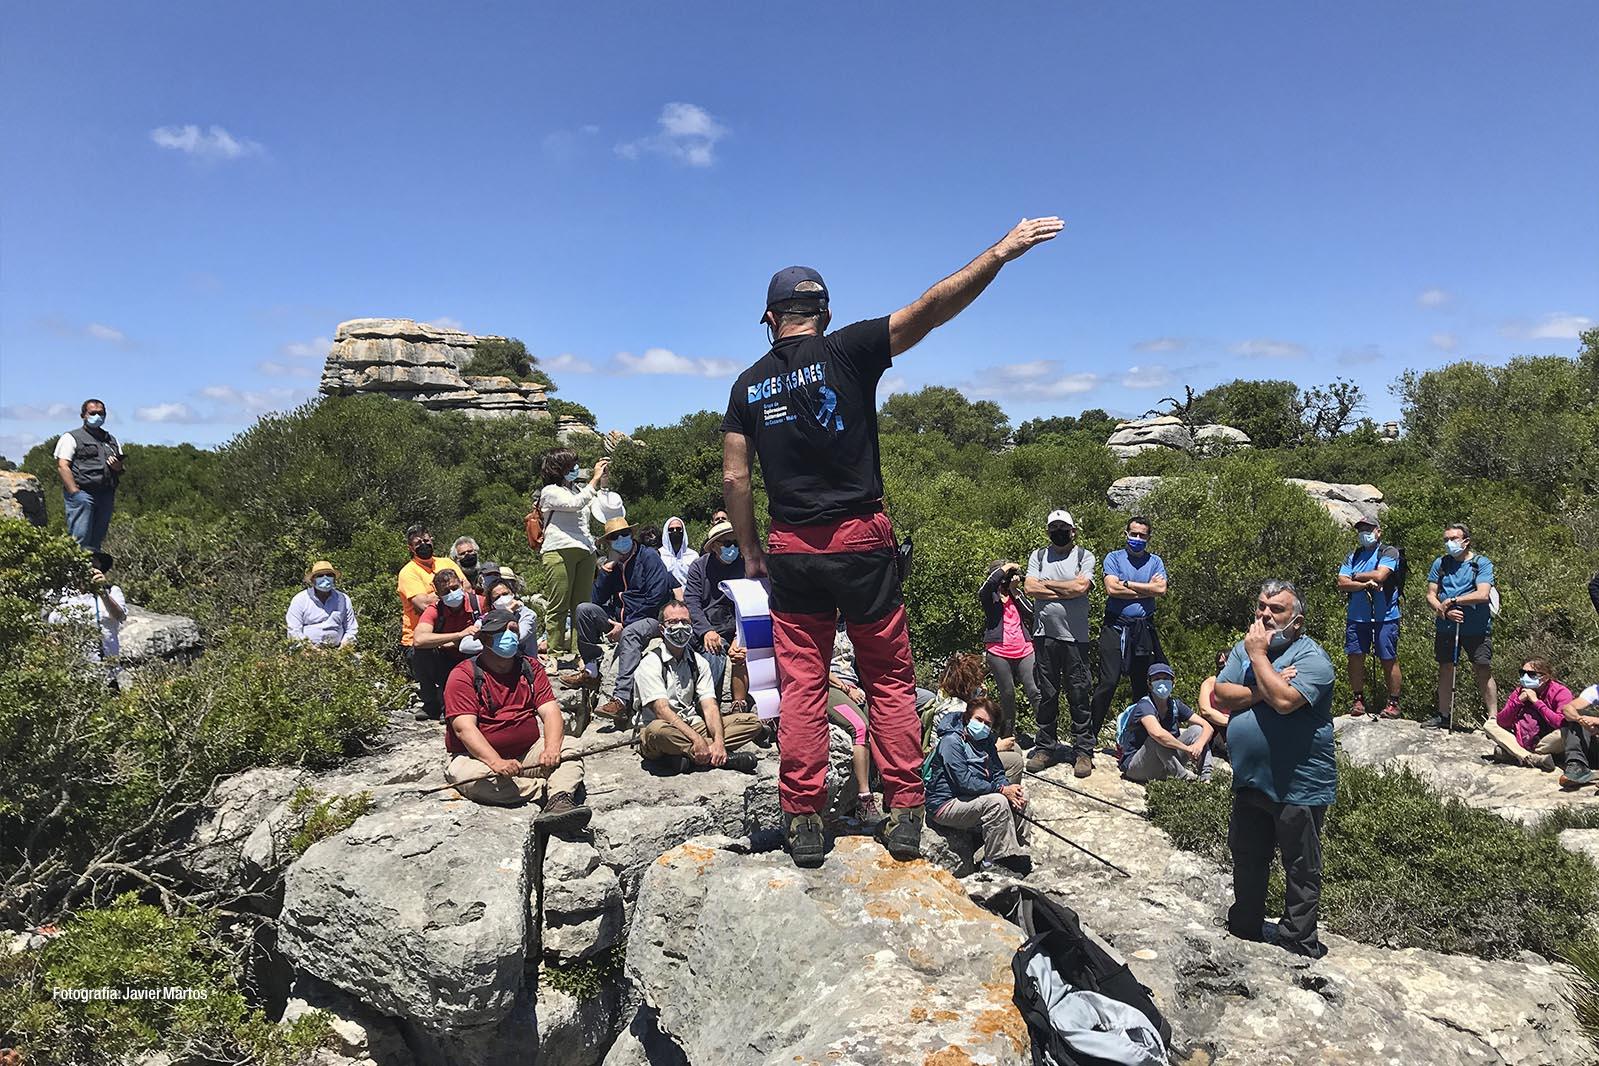 Jorge L. Romo en las Jornadas de Patrimonio de Casares 2021